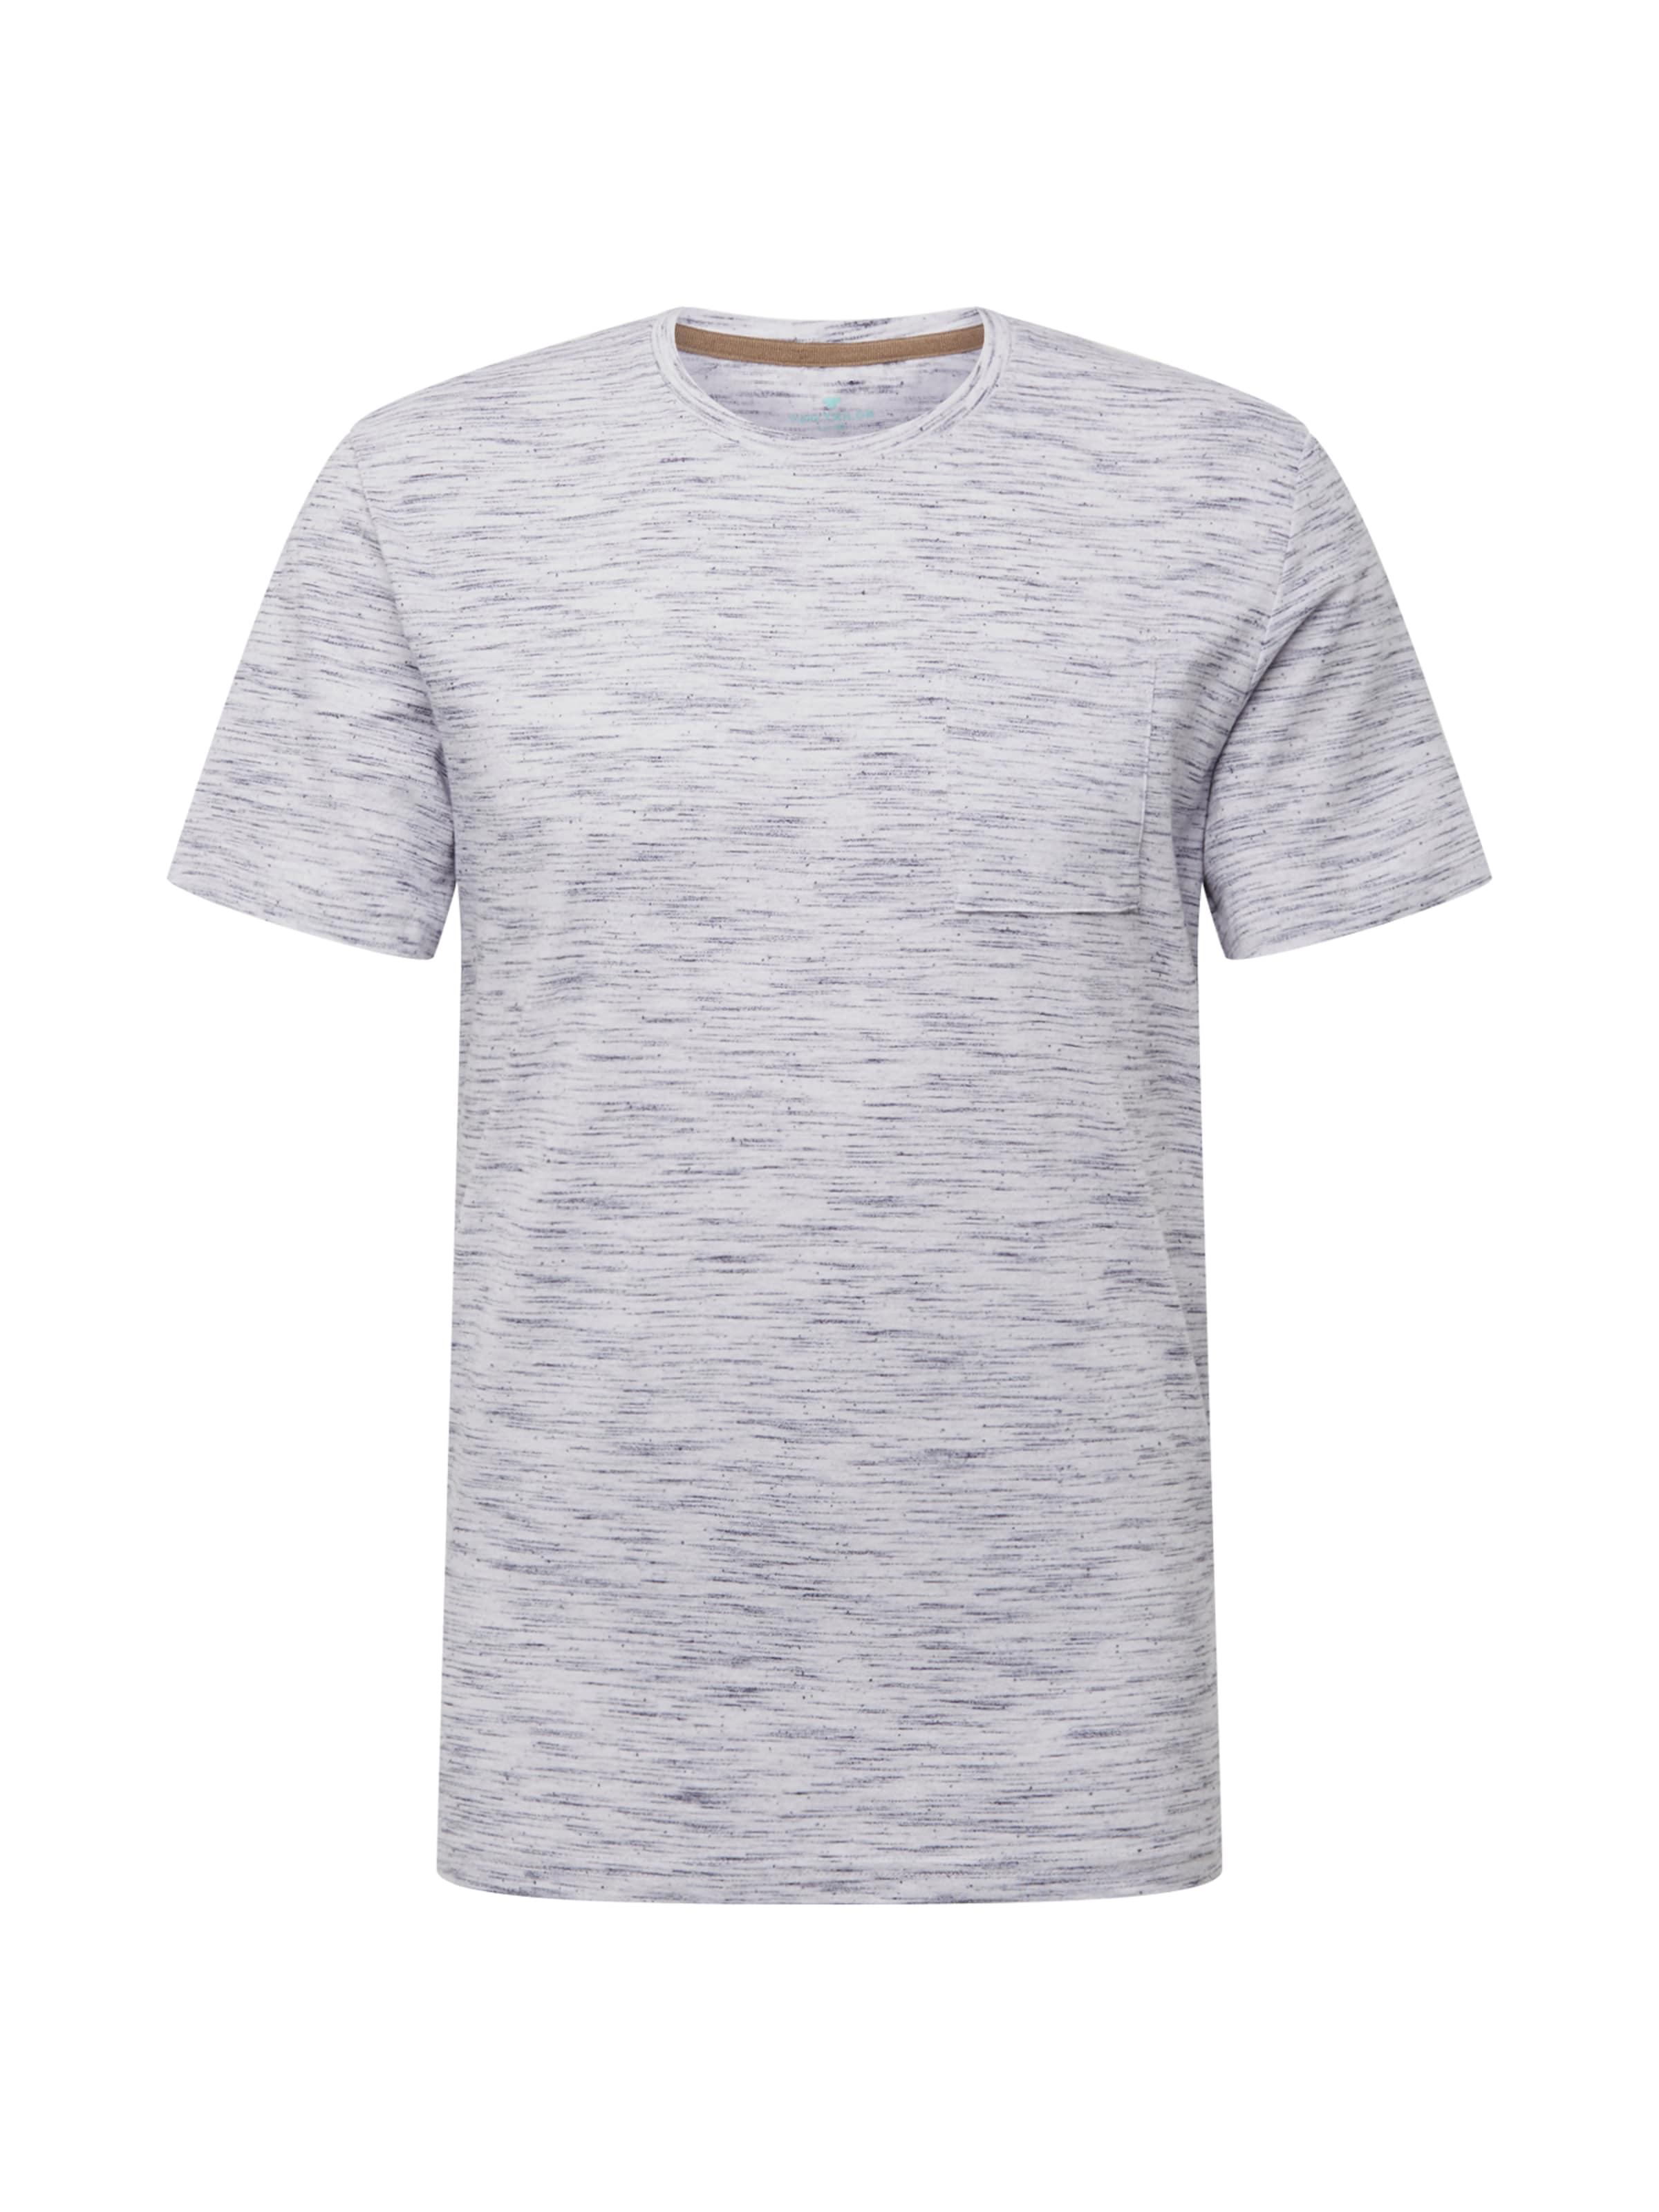 Taubenblau Tom Tailor T In shirt lF31cTKJ